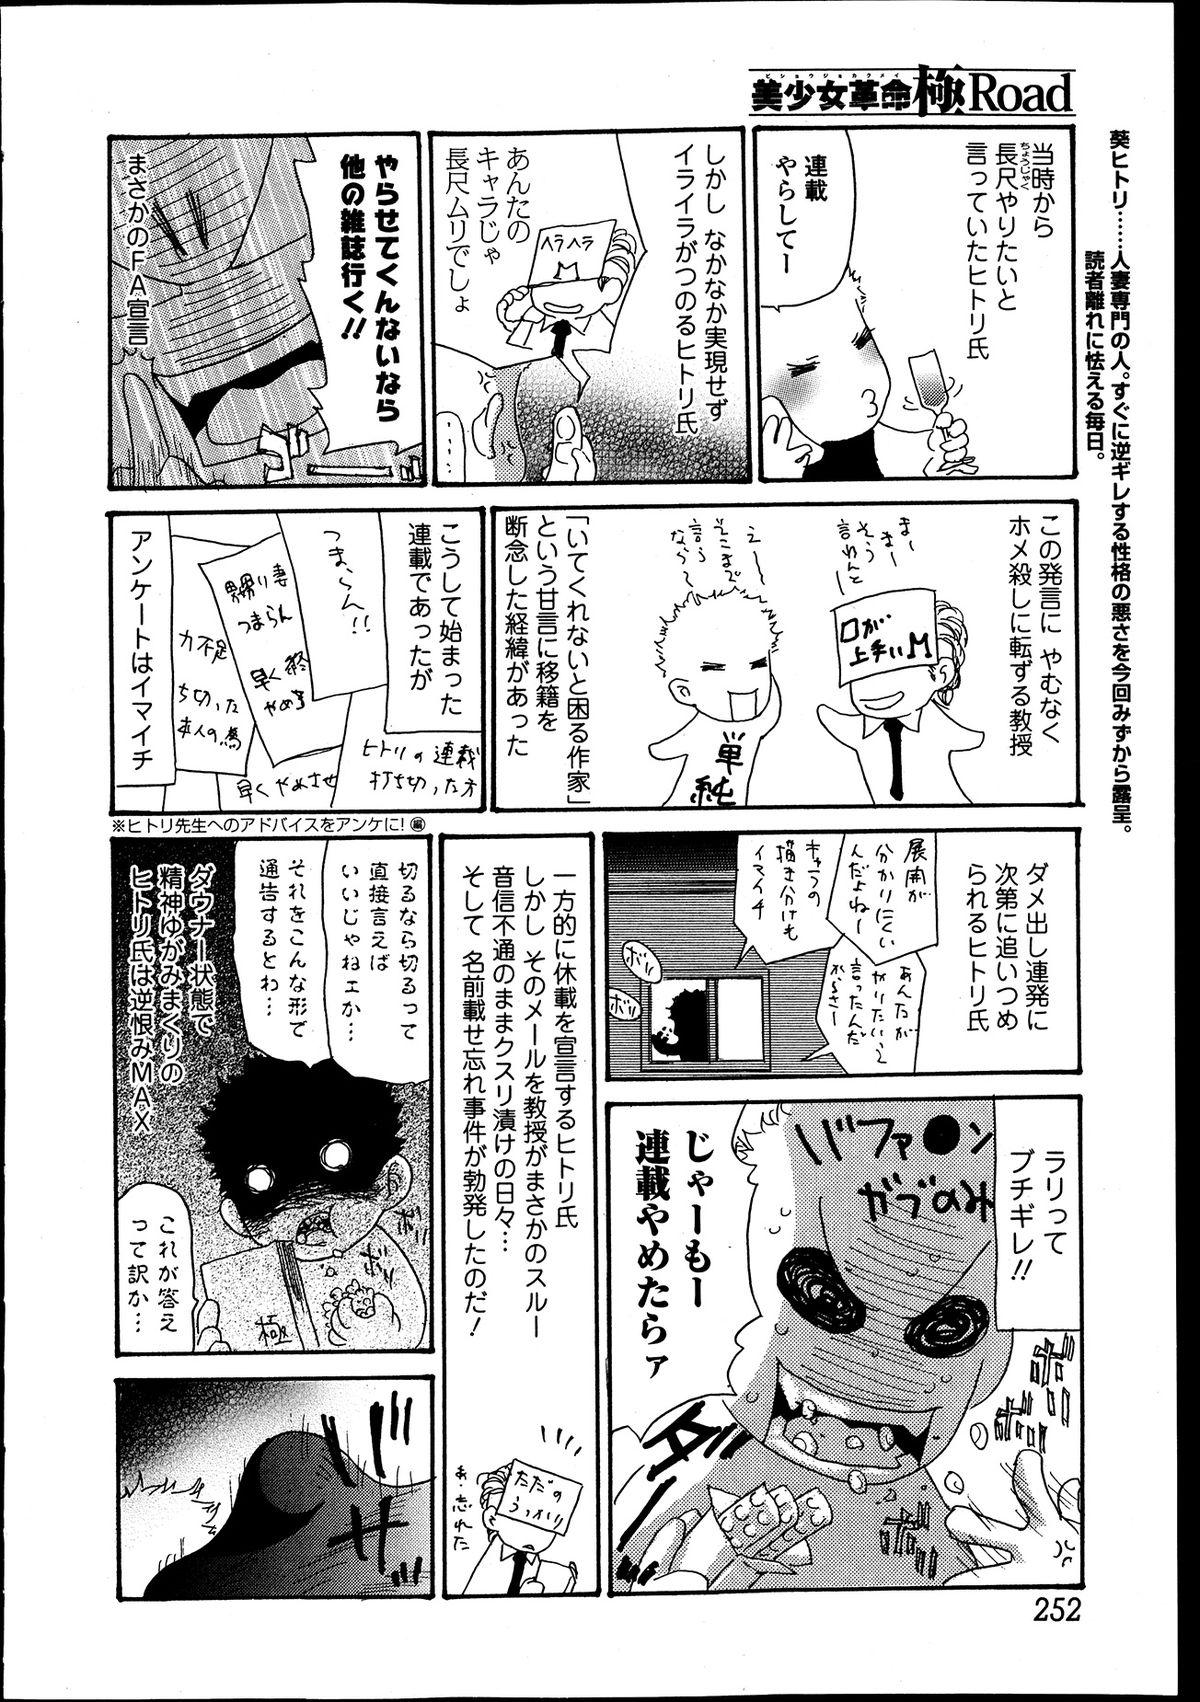 Bishoujo Kakumei KIWAME Road Vol.9 251